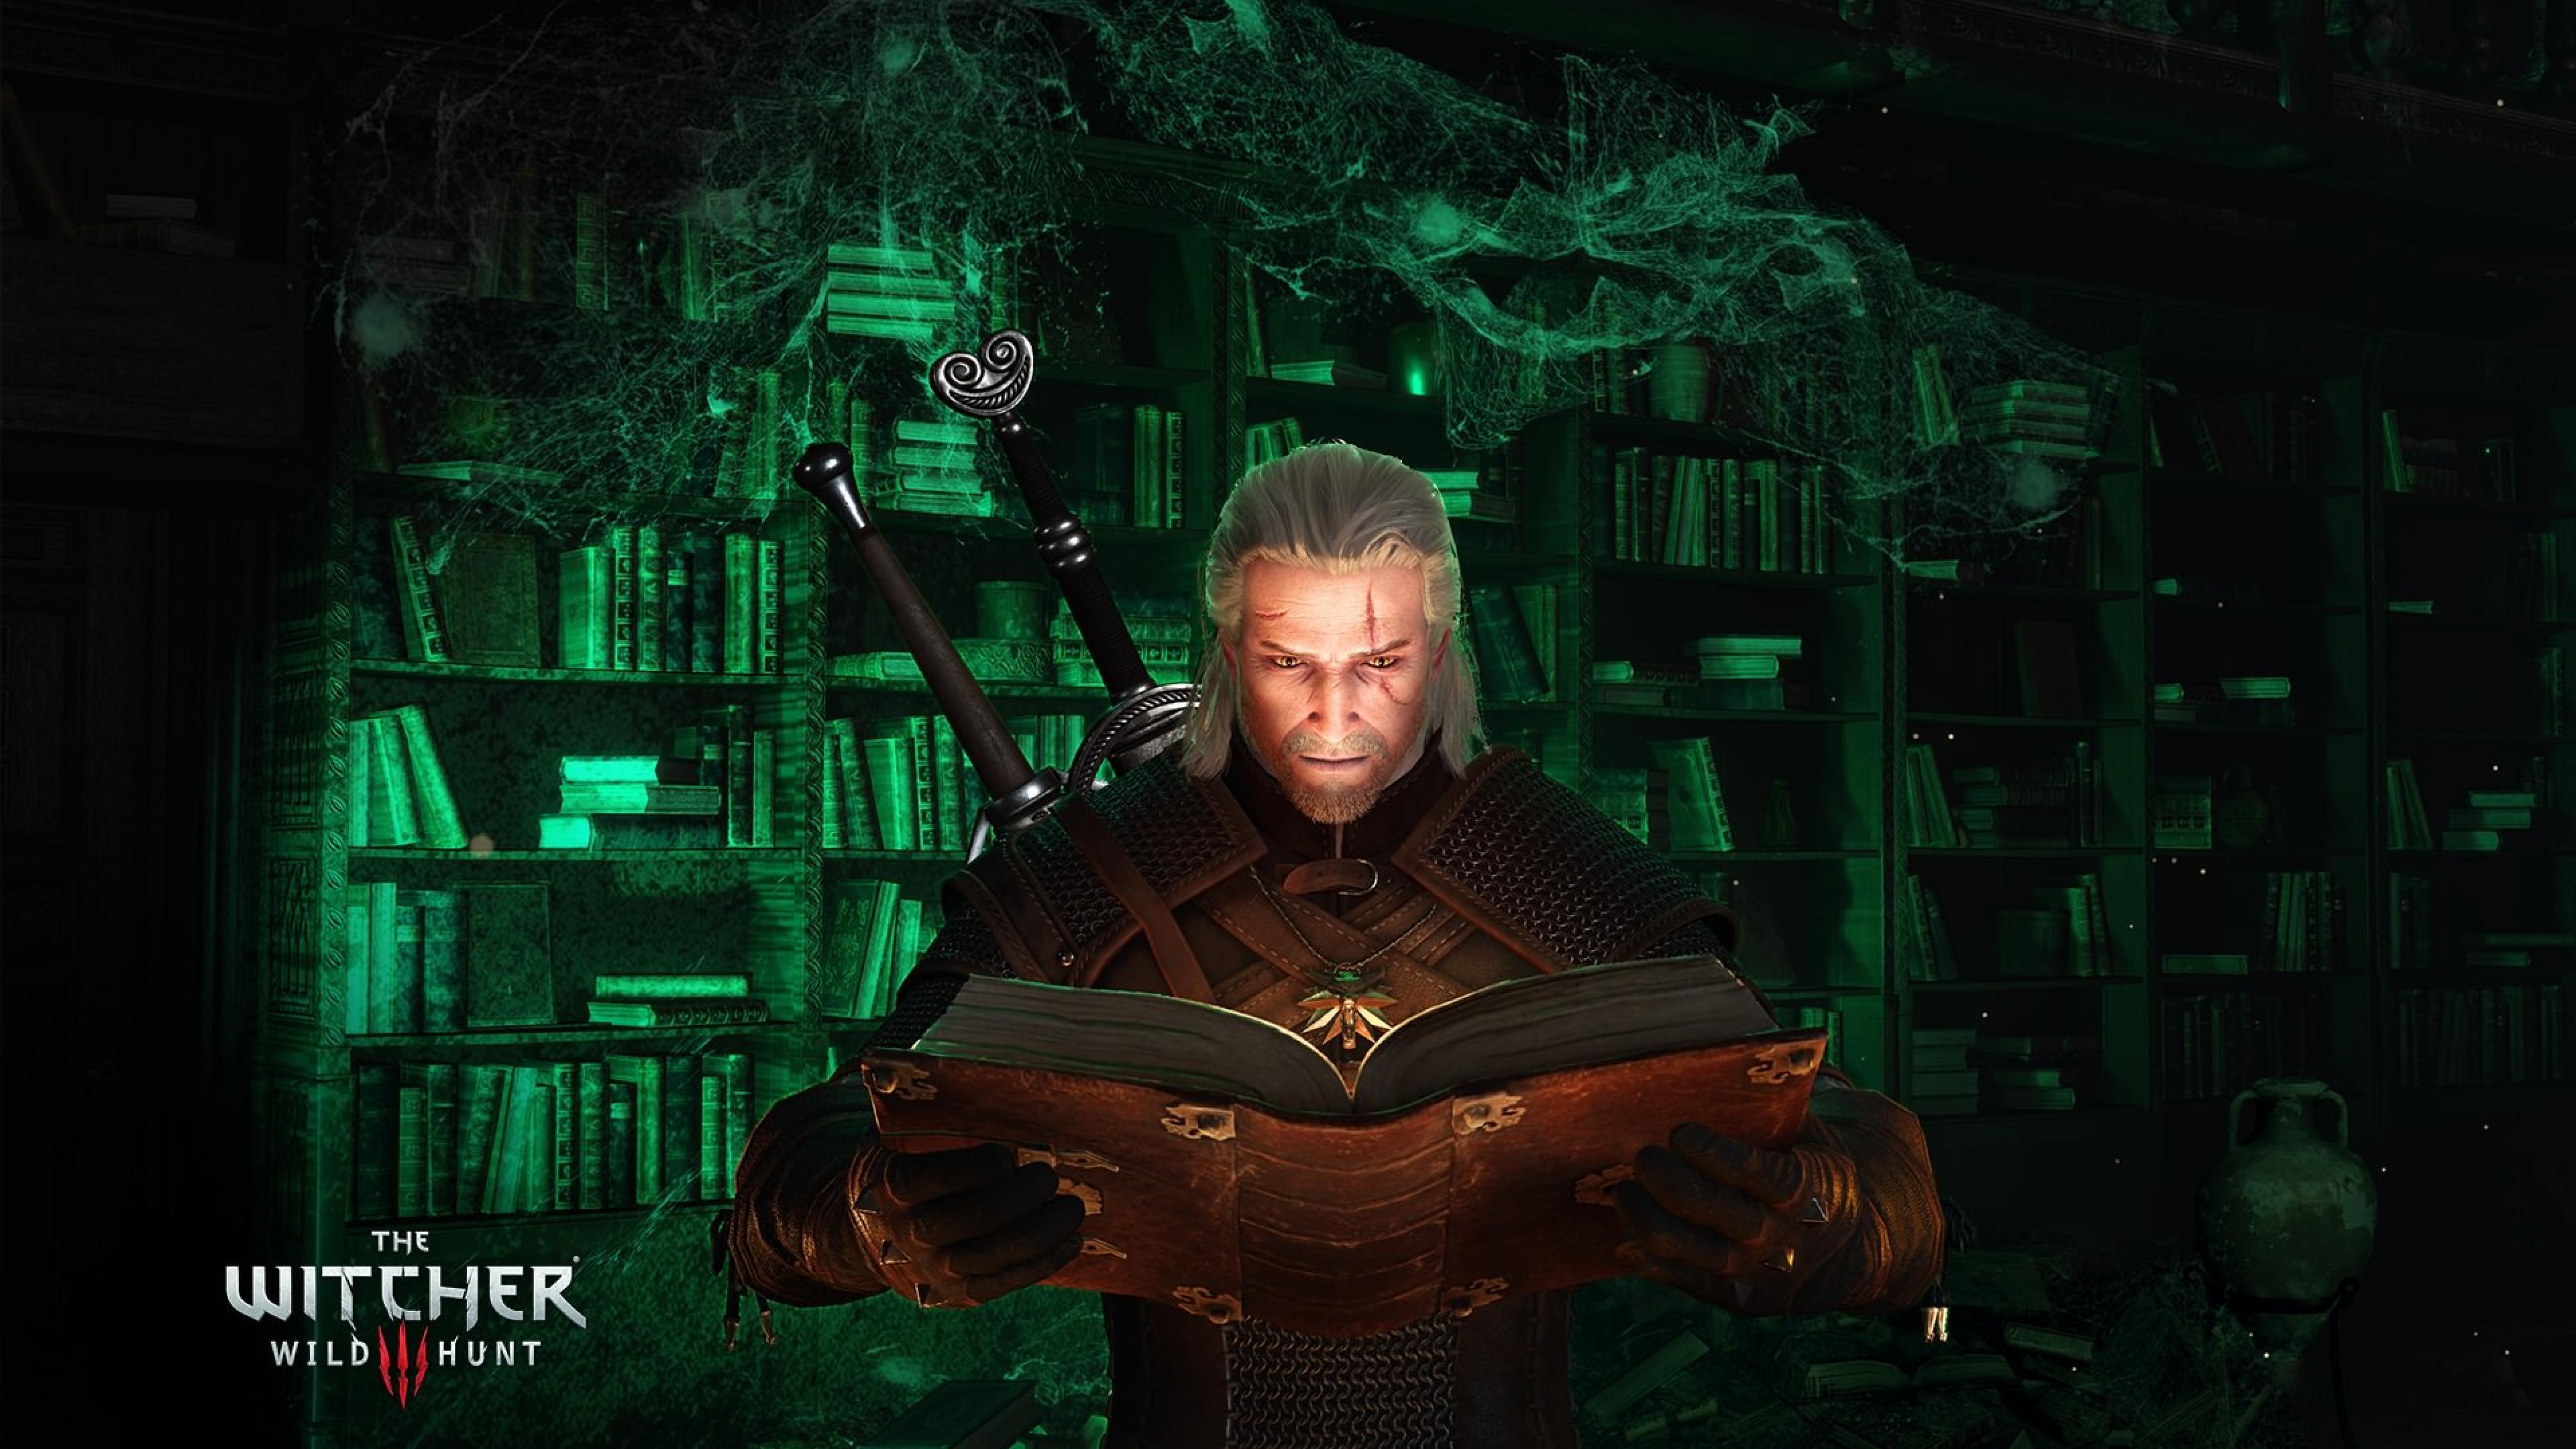 3840x2160 Geralt Of Rivia The Witcher 3 Wild Hunt 4k